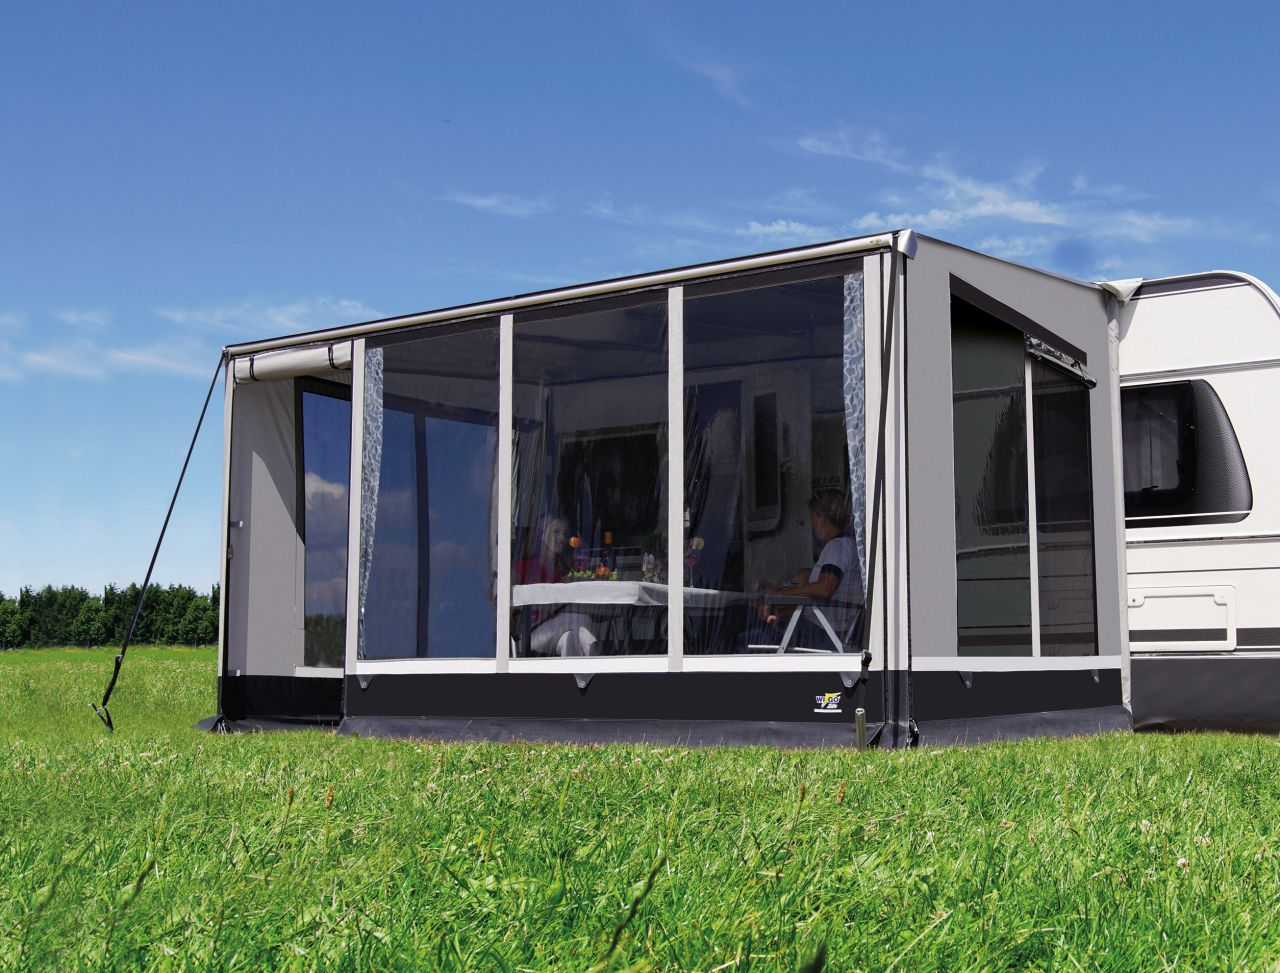 wigo markise rolli premium 3 x 2 5 m 93 780 fun and home. Black Bedroom Furniture Sets. Home Design Ideas